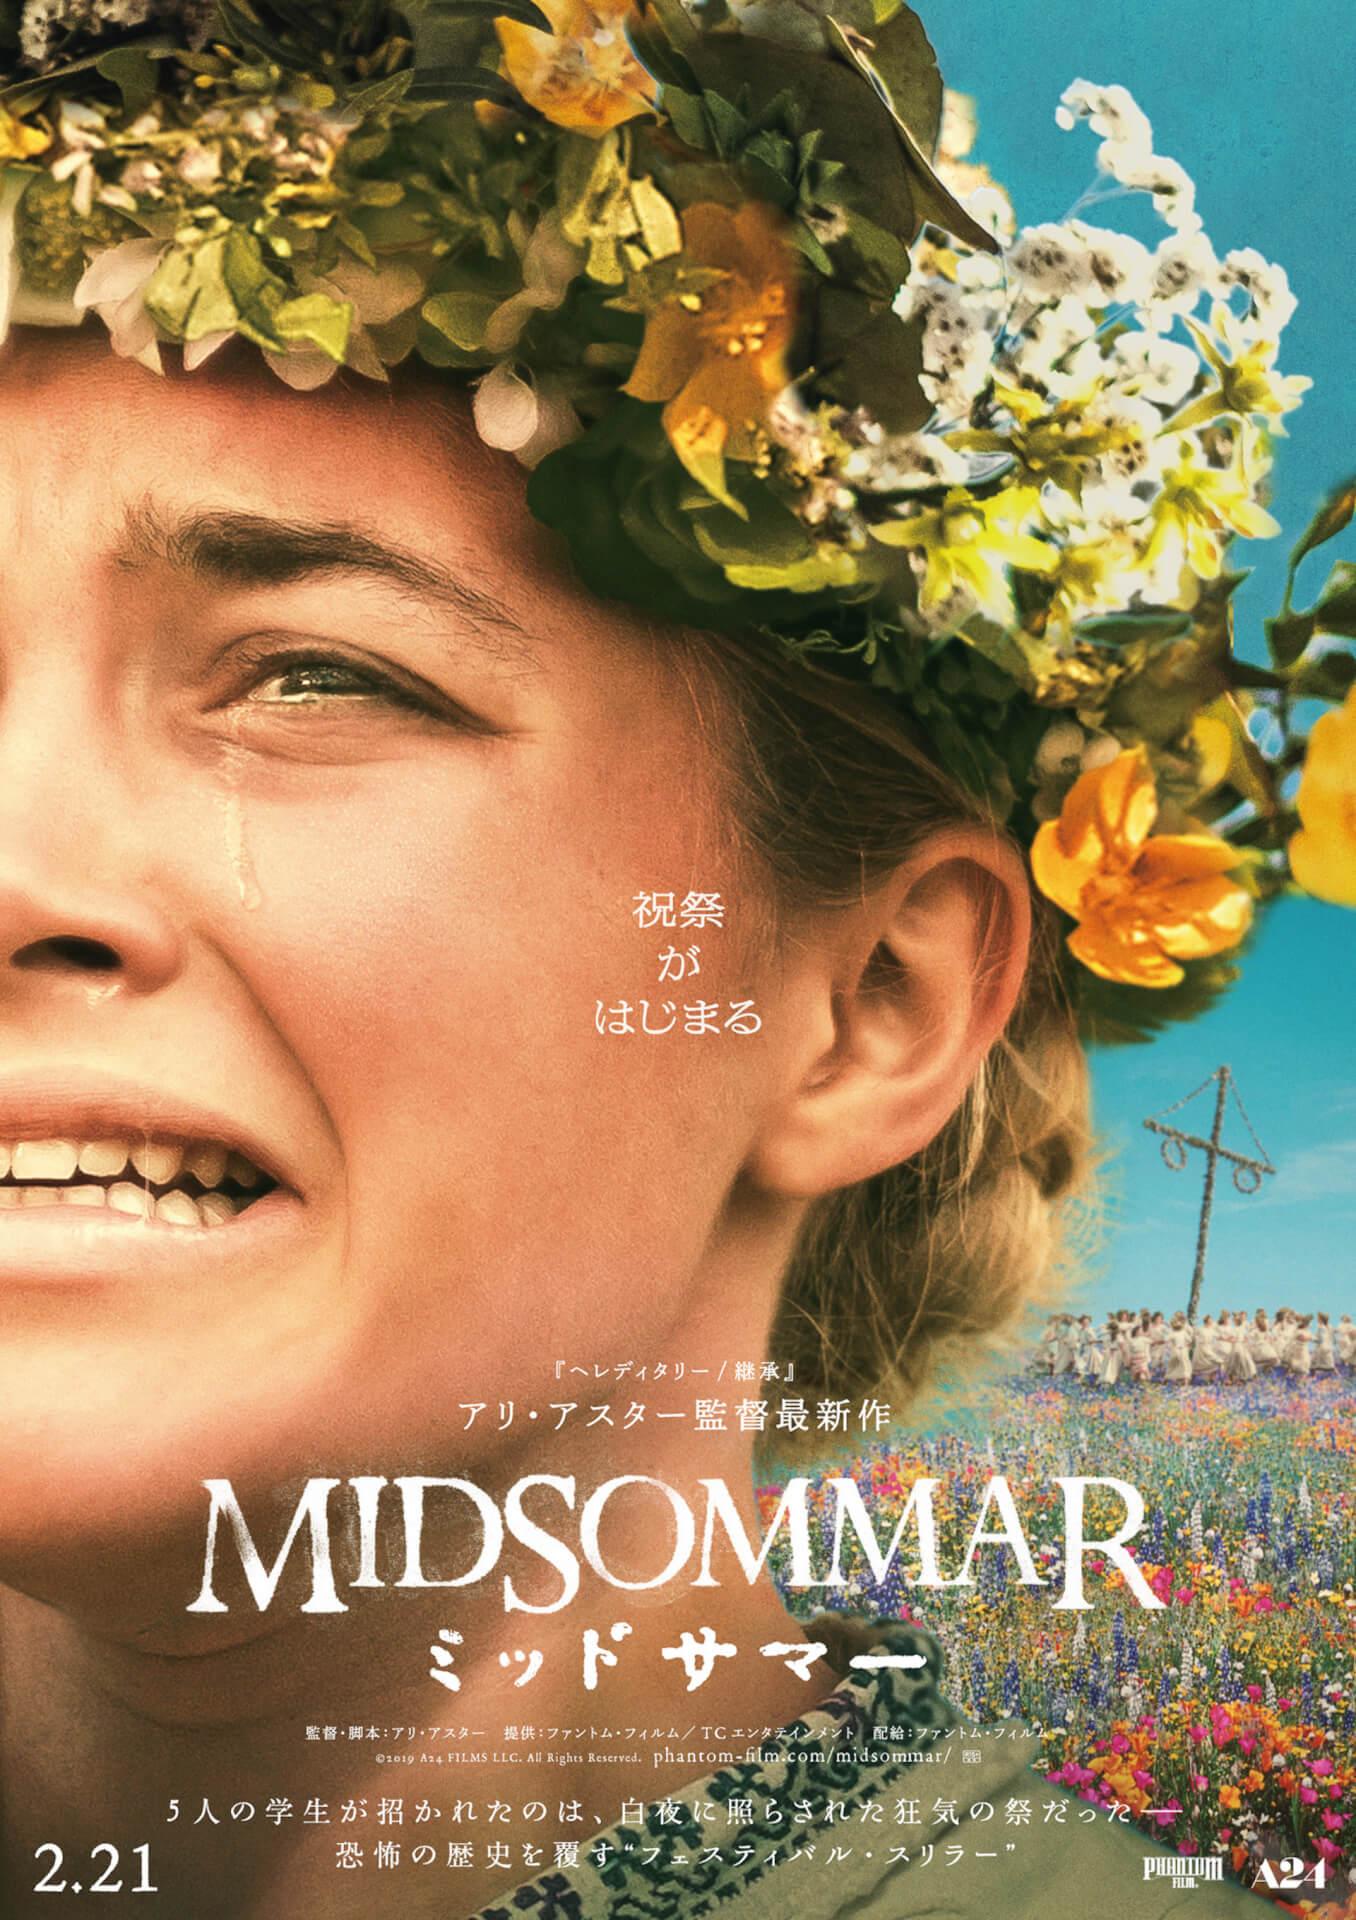 TwitterやInstagramで祝祭が始まる…映画『ミッドサマー』SNSお花畑プレゼントキャンペーンが実施 film200120_midsommarflower_05